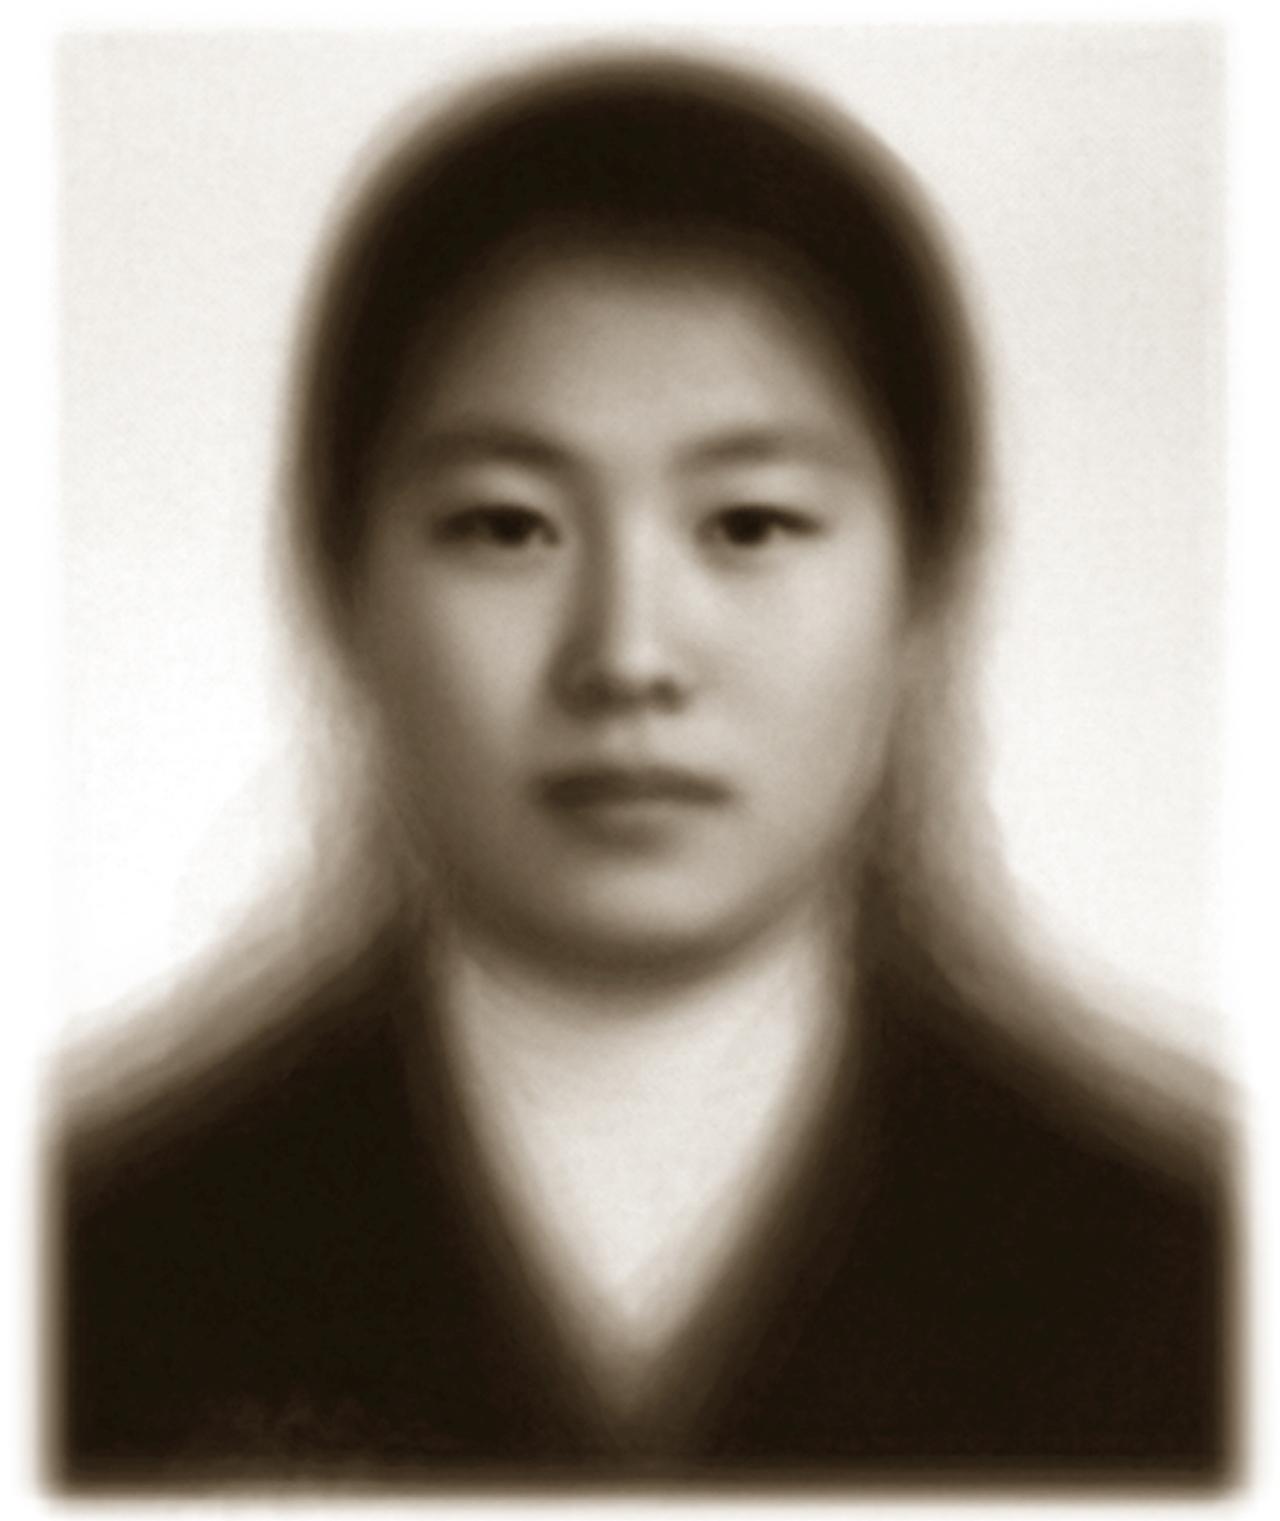 """High School Uni-Face: Girl"" by Suh Do-ho (Courtesy of the artist)"